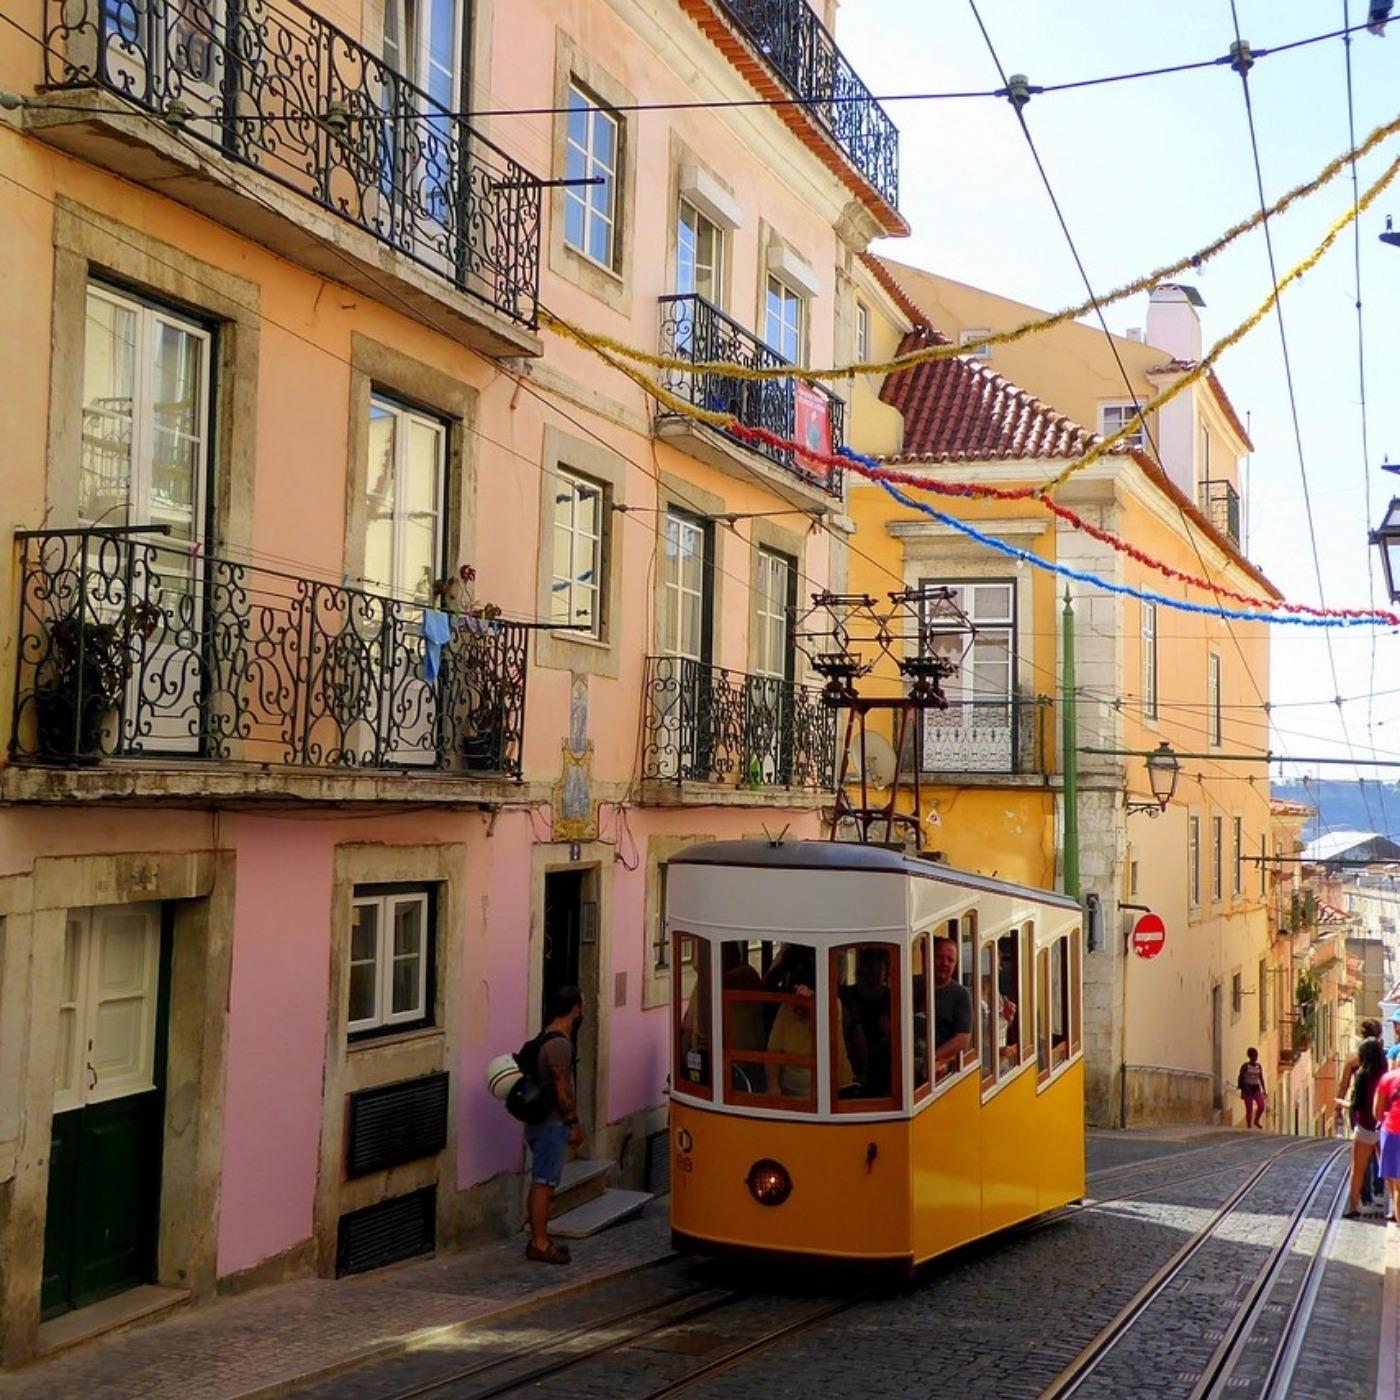 308 - Brasileiros em Portugal II 🇵🇹